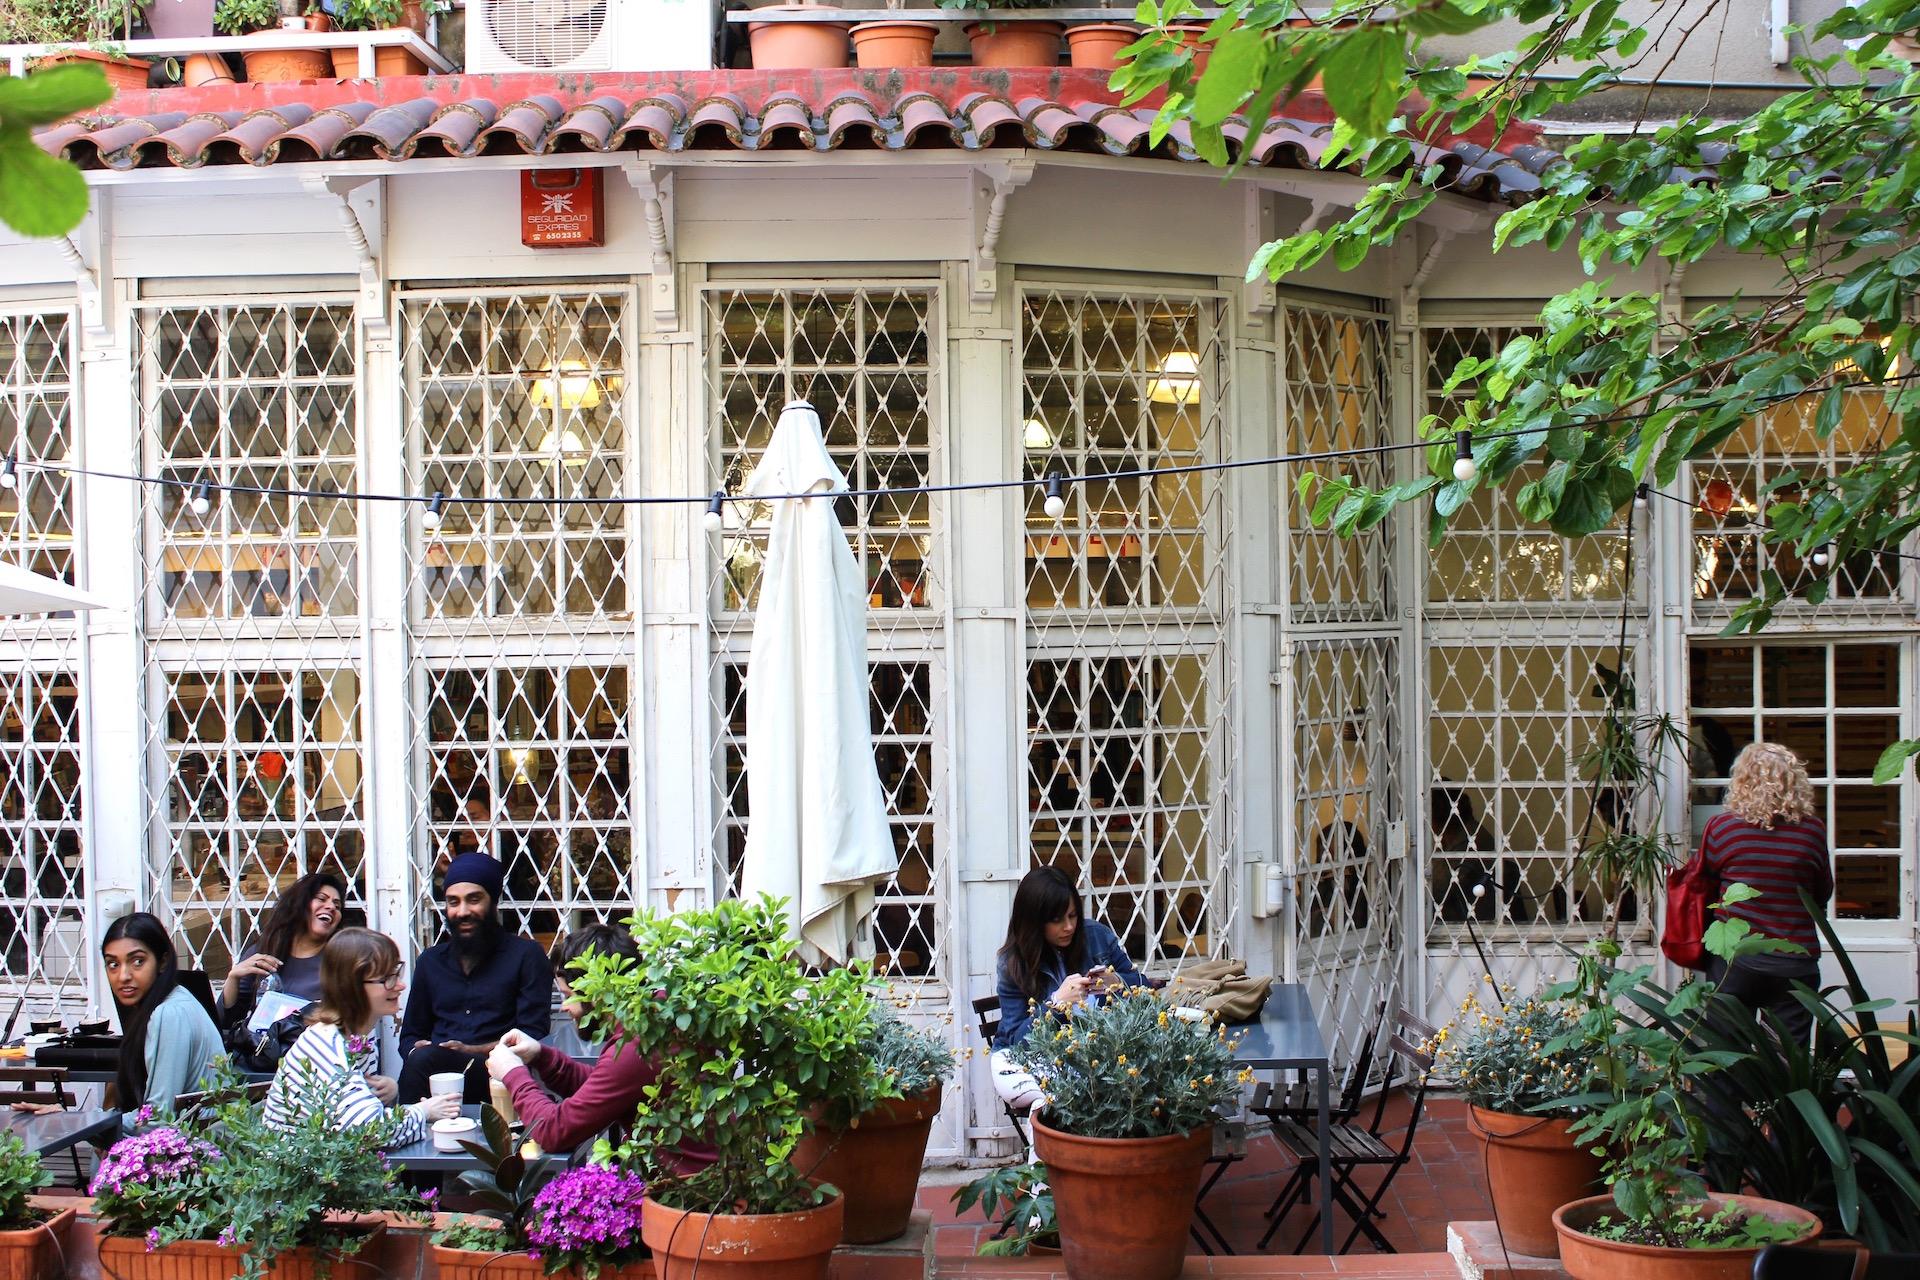 Outside El Café de la Central